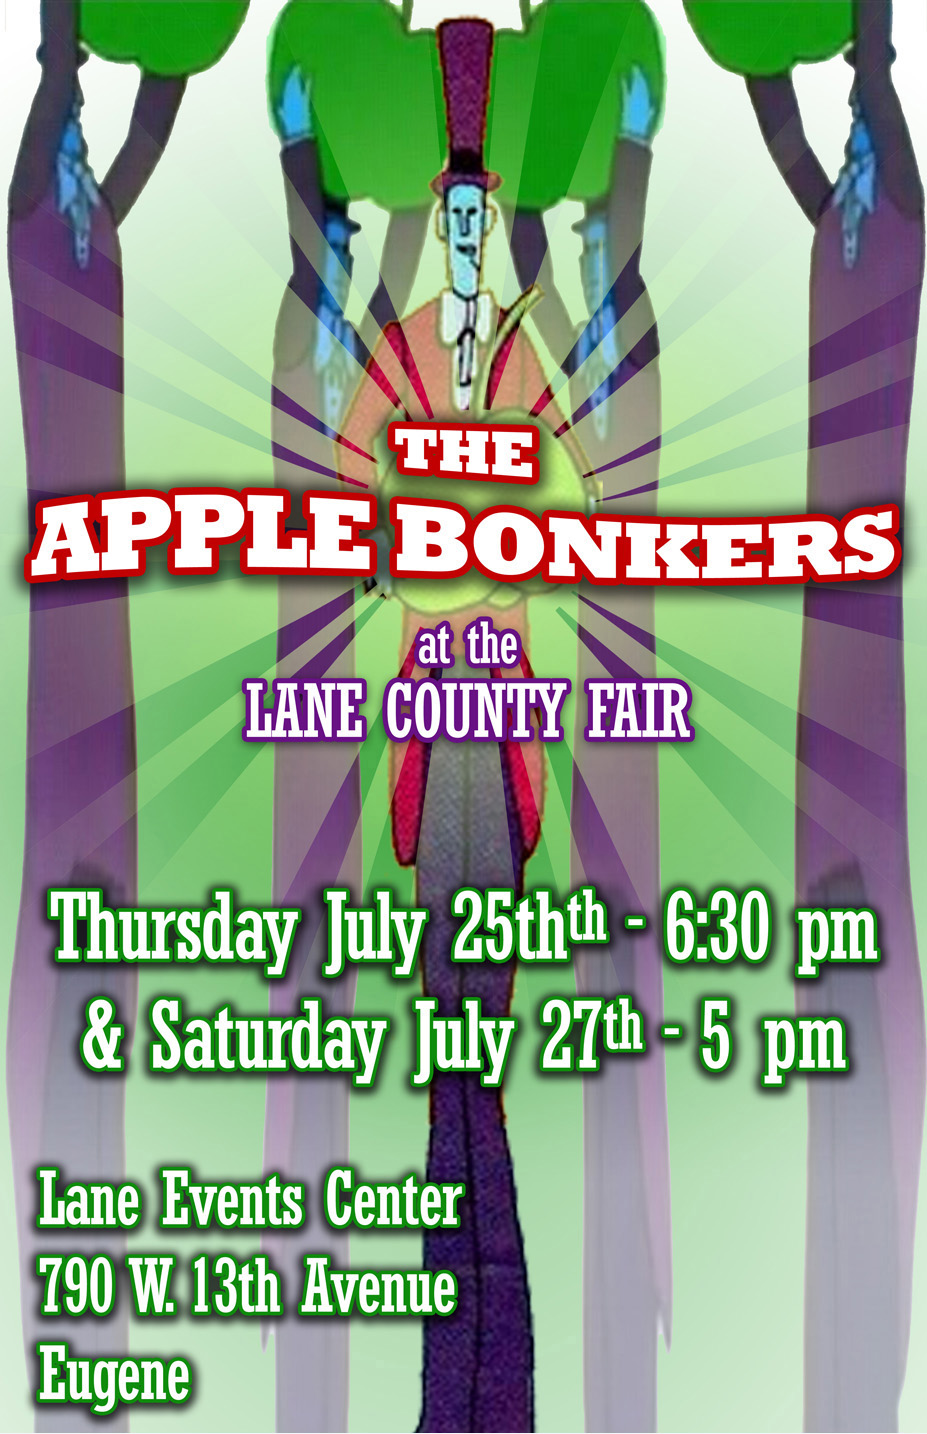 The Apple Bonkers Gig Flyer